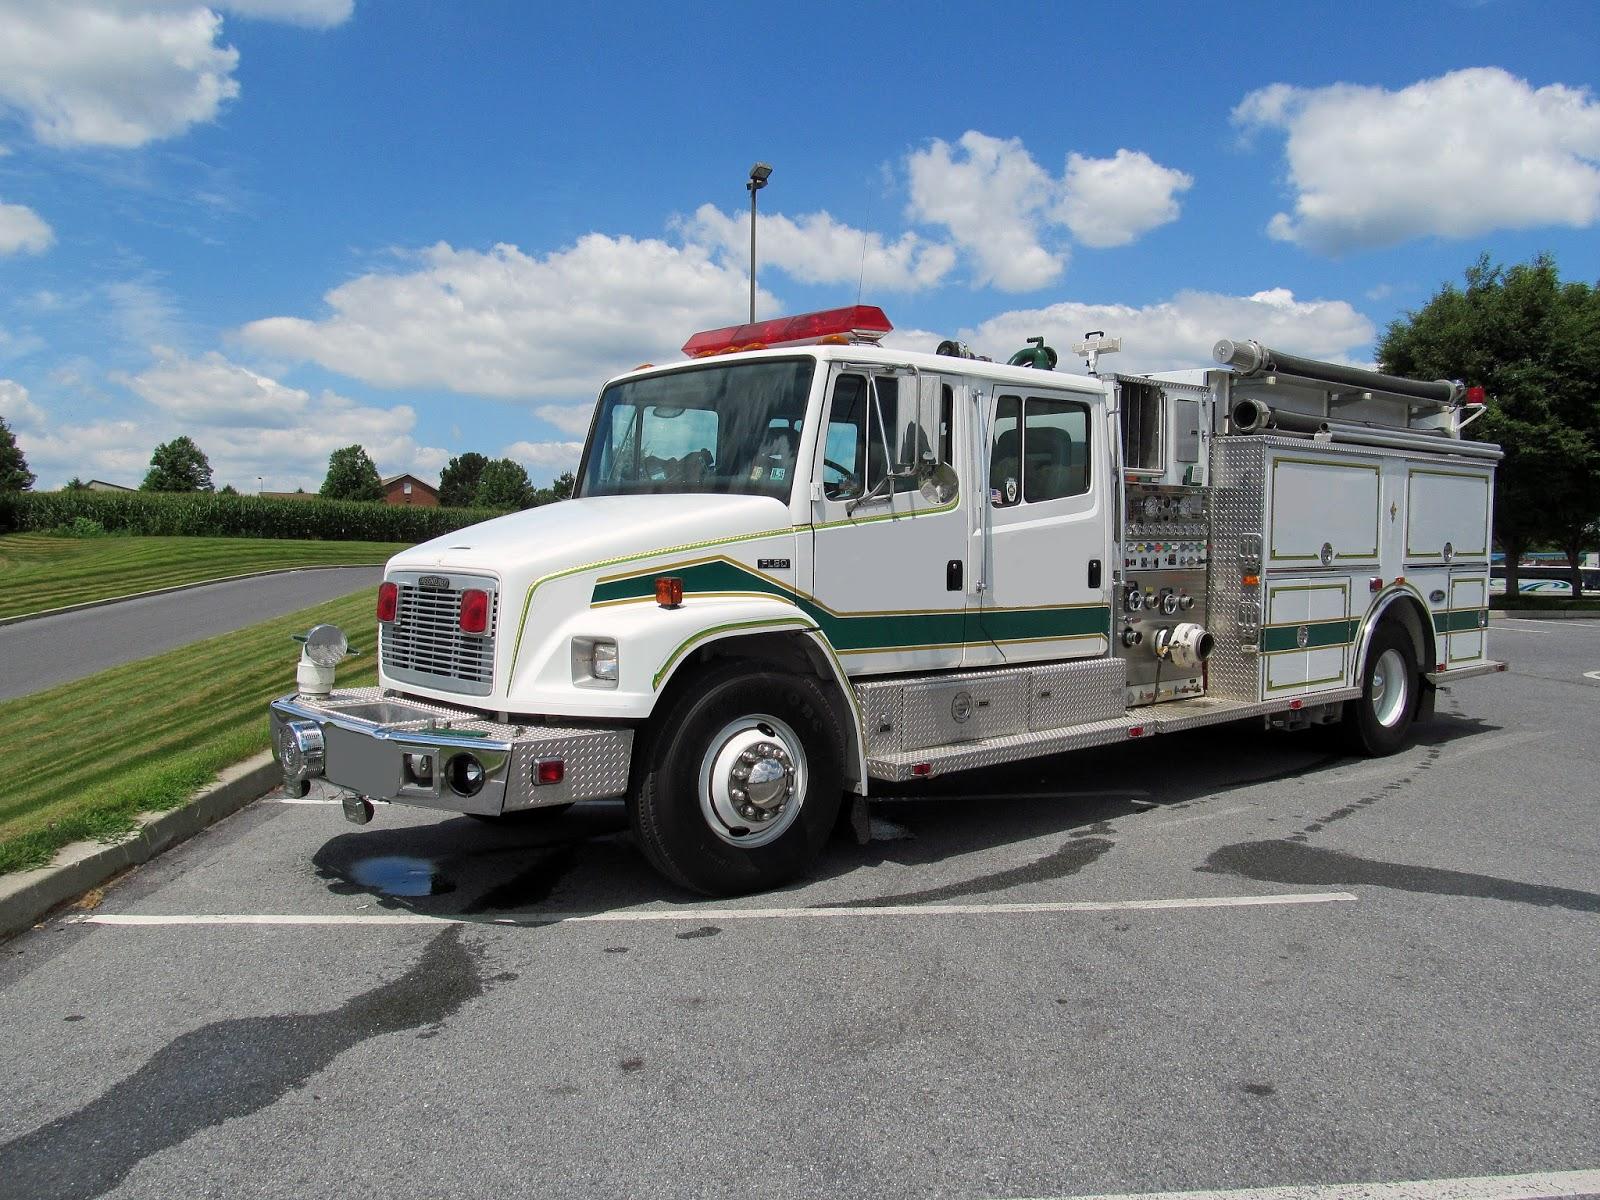 Used Fire Trucks : Fire line equipment used trucks for sale